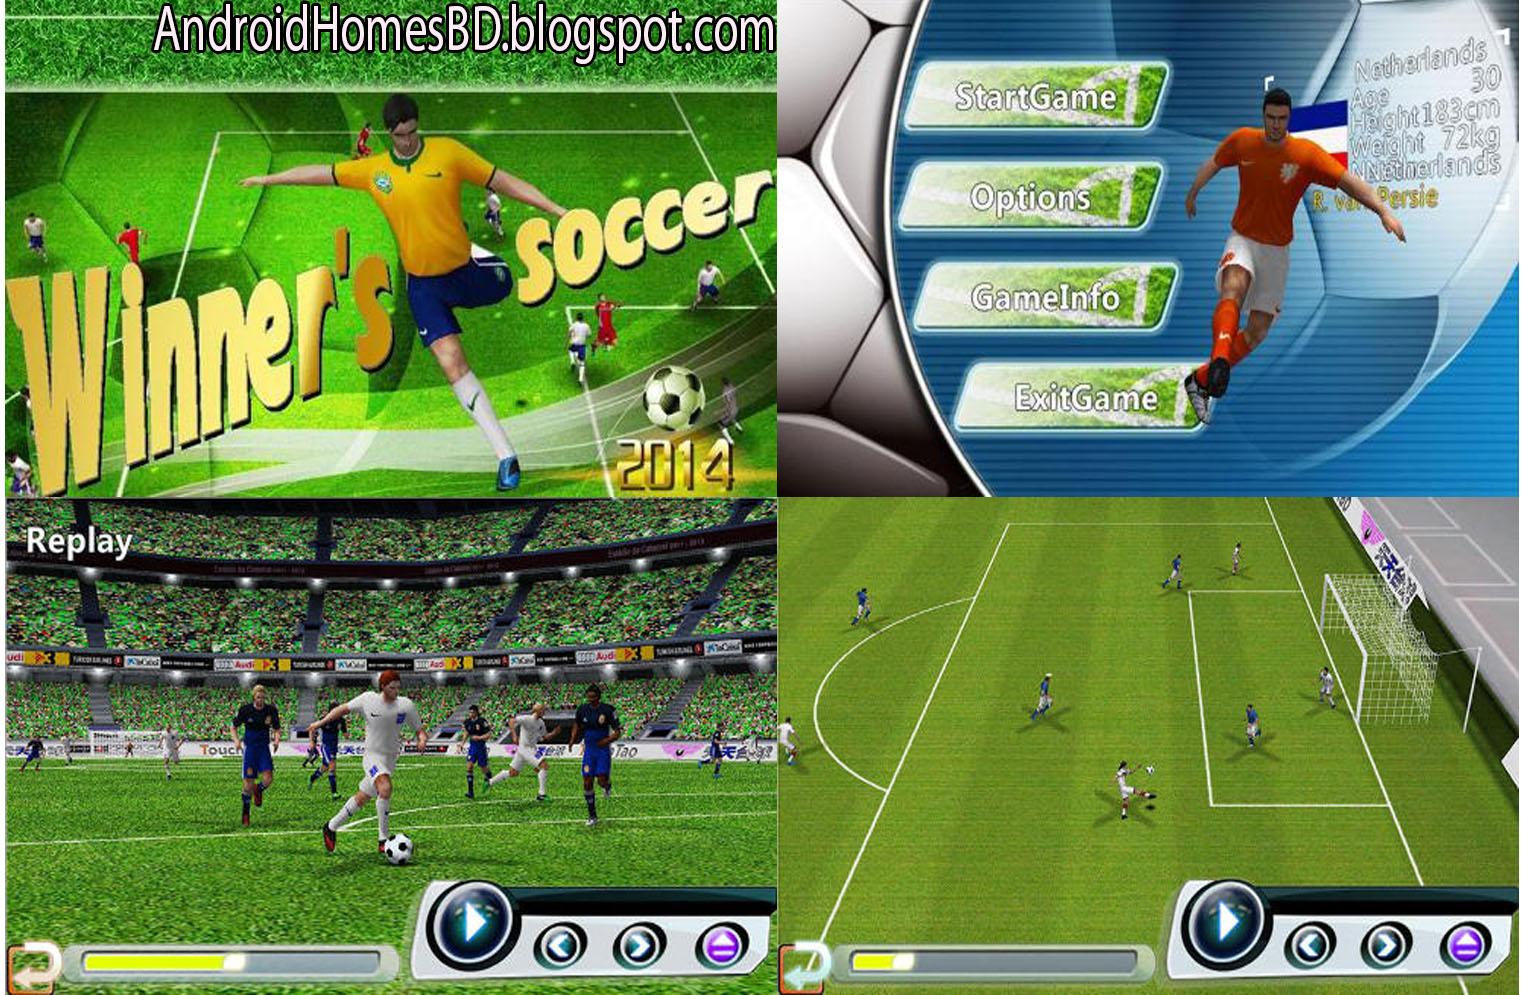 "Football পাগলারা আপনার এন্ডোয়েড মোবাইলে খেলুন বাস্থব সম্মত একটি Football গেইম""Winner's Soccer:Evolution Elite""।মেগাবাইট আপনার সাধ্যের মধ্যে।"